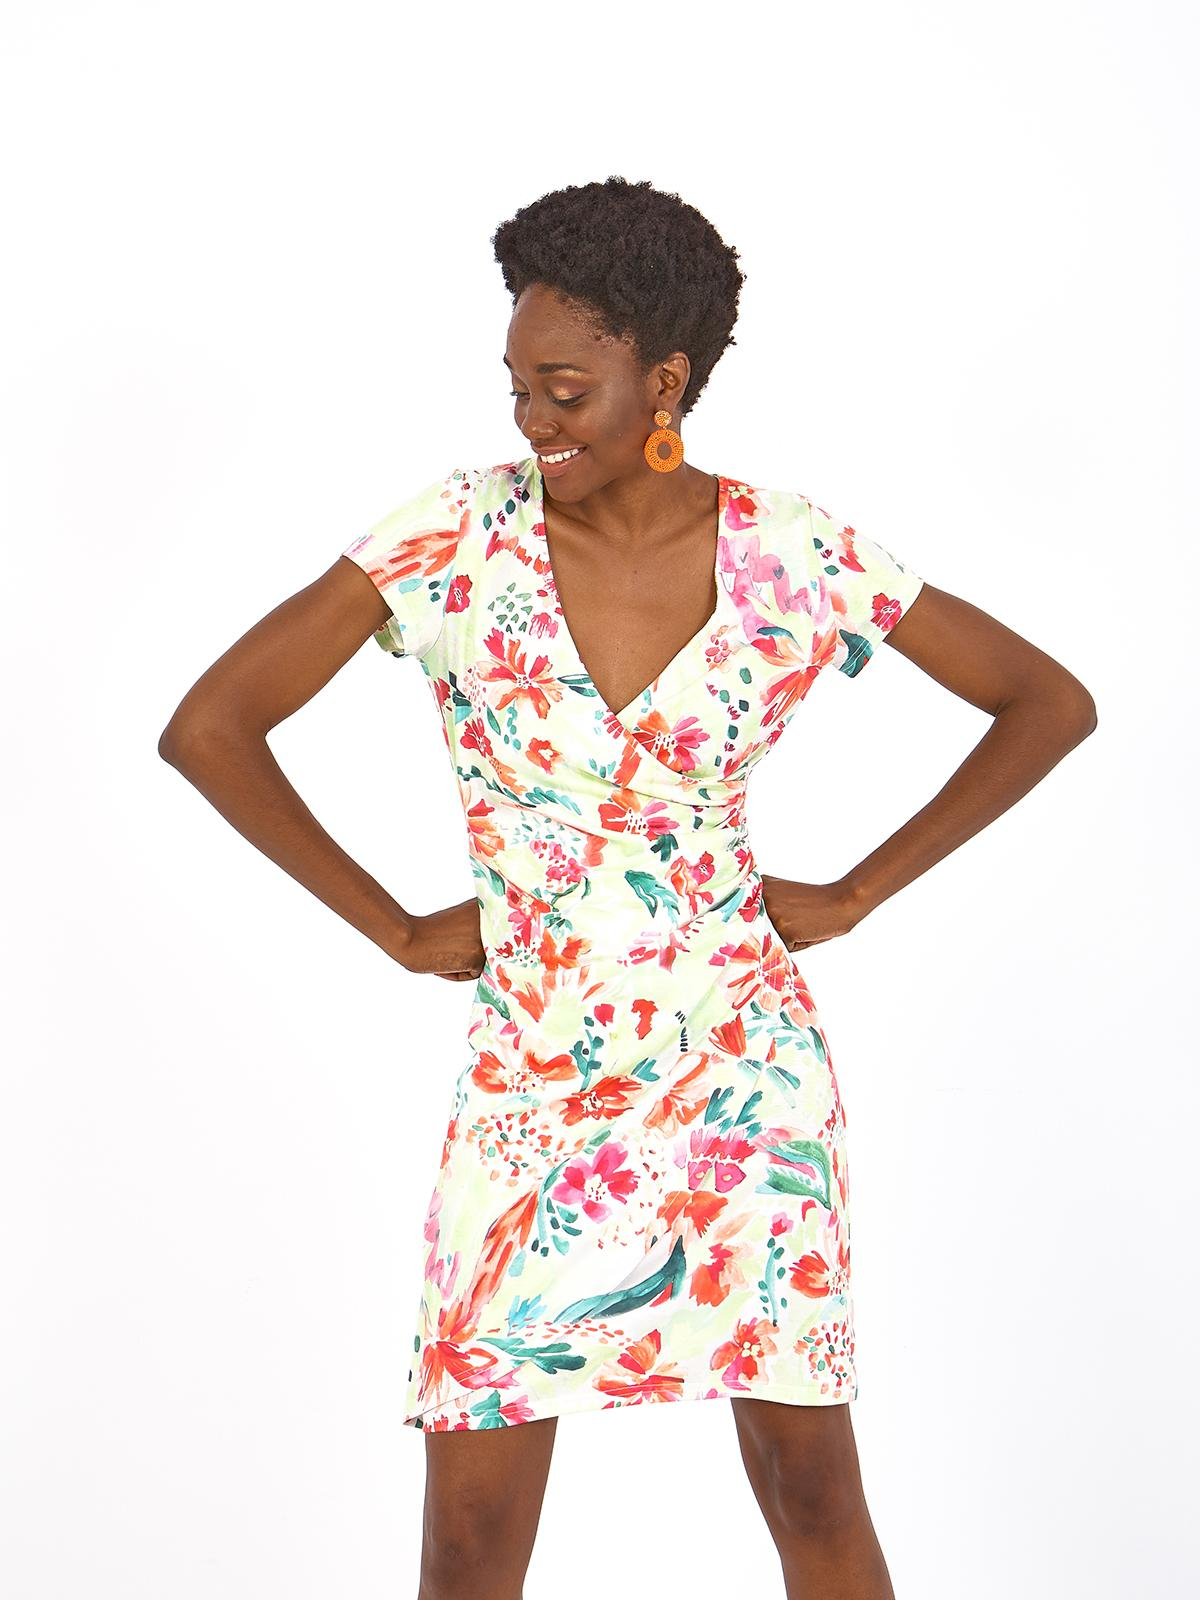 vestido manga corta cruzado, co estampado de flores